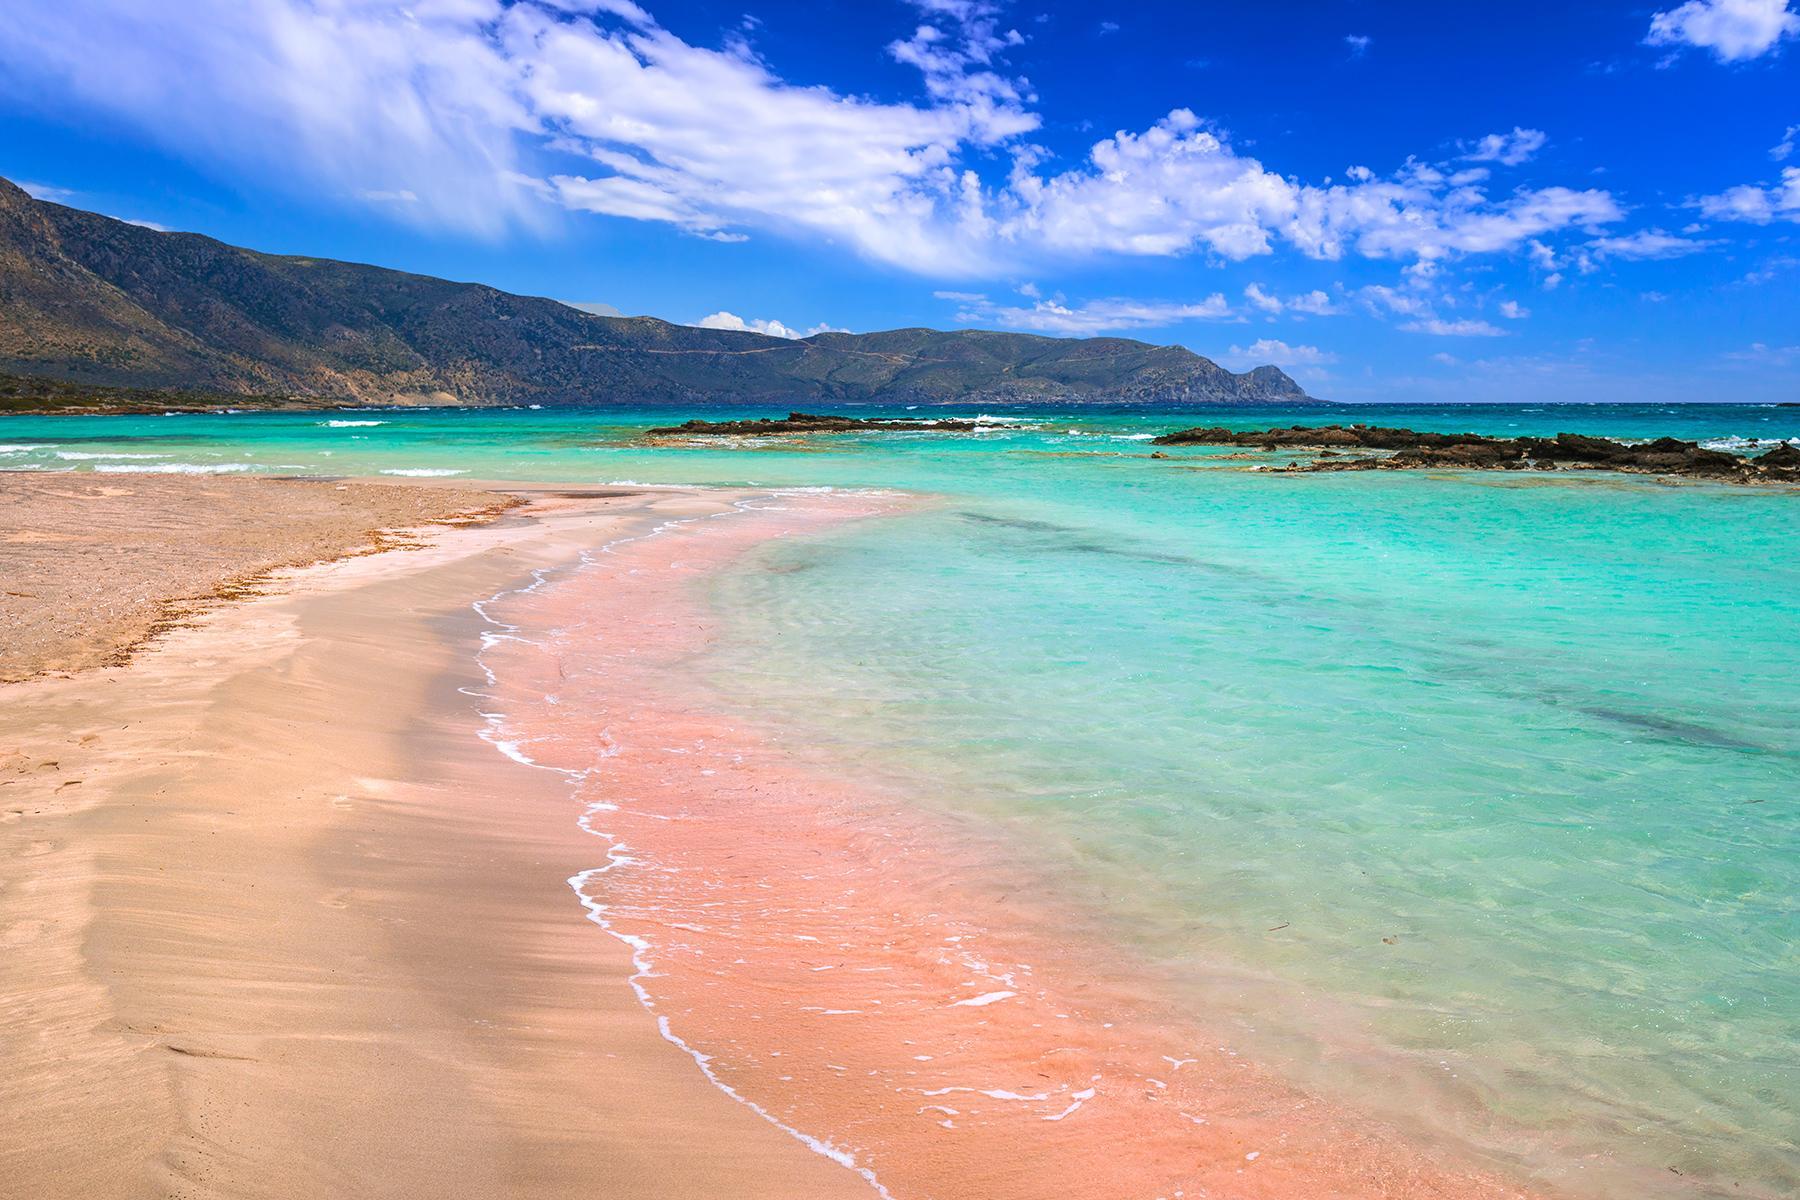 Greek Island Beaches: 35 Best Beaches In Greece And The Greek Islands